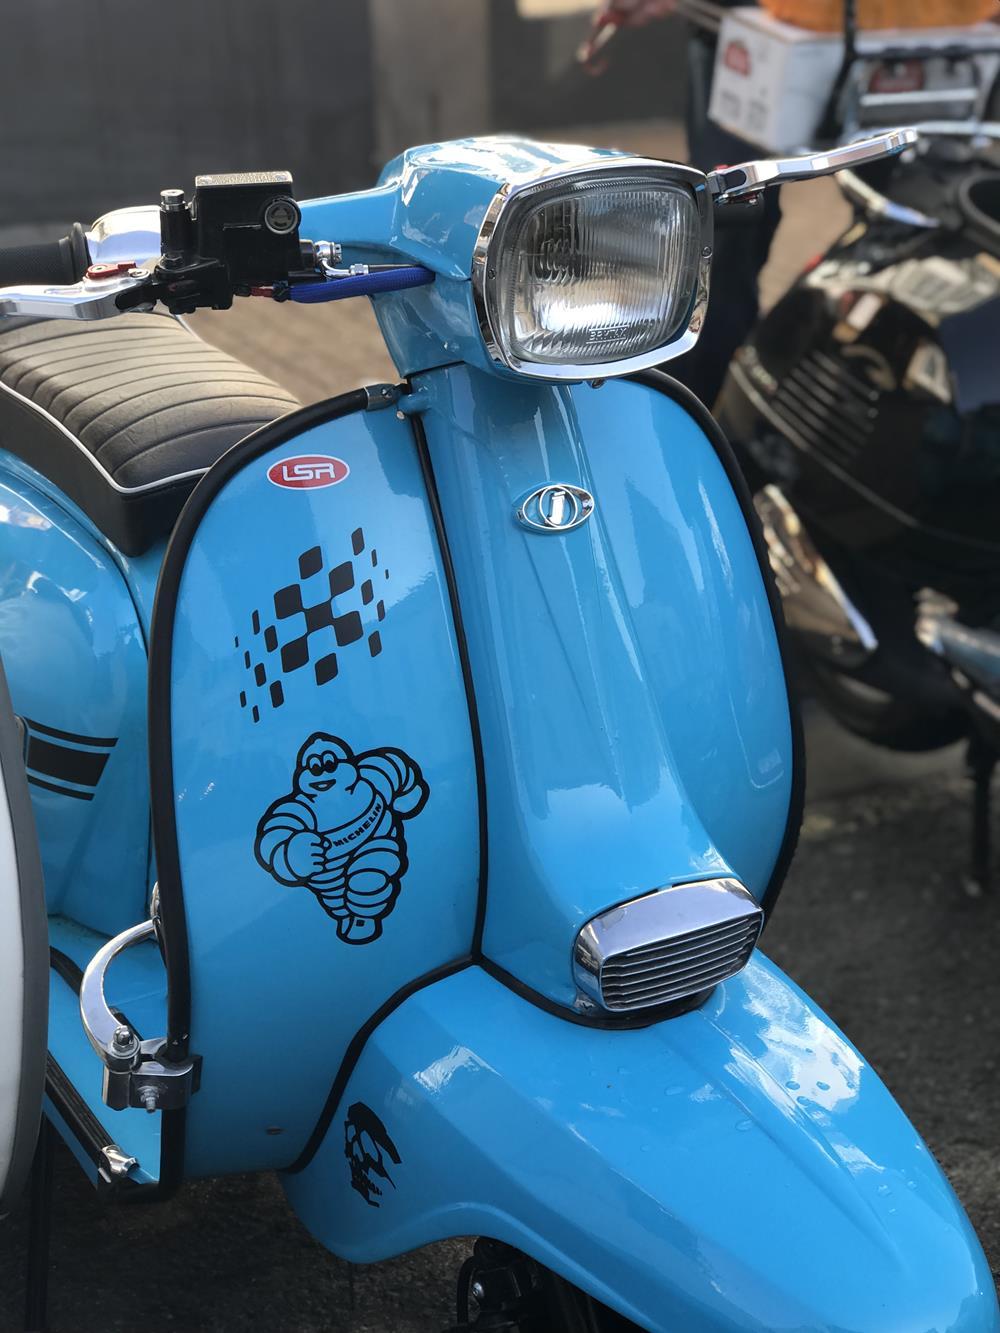 Sky blue Lambretta scooter